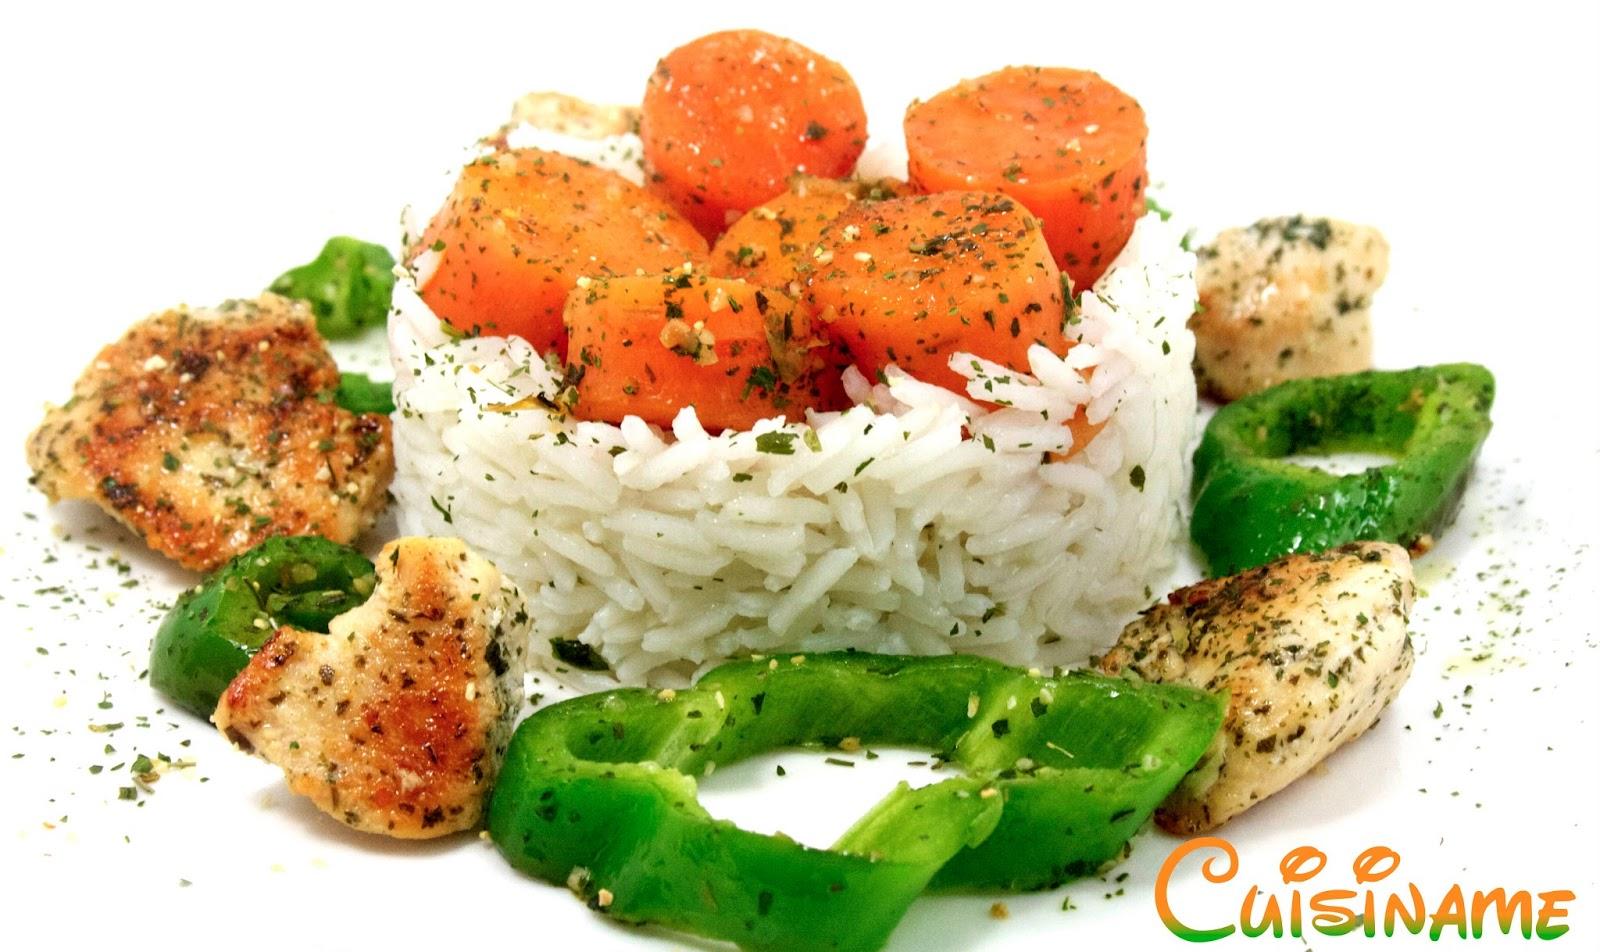 arroz con pollo receta light arroz pollo recetas sanas recetas de